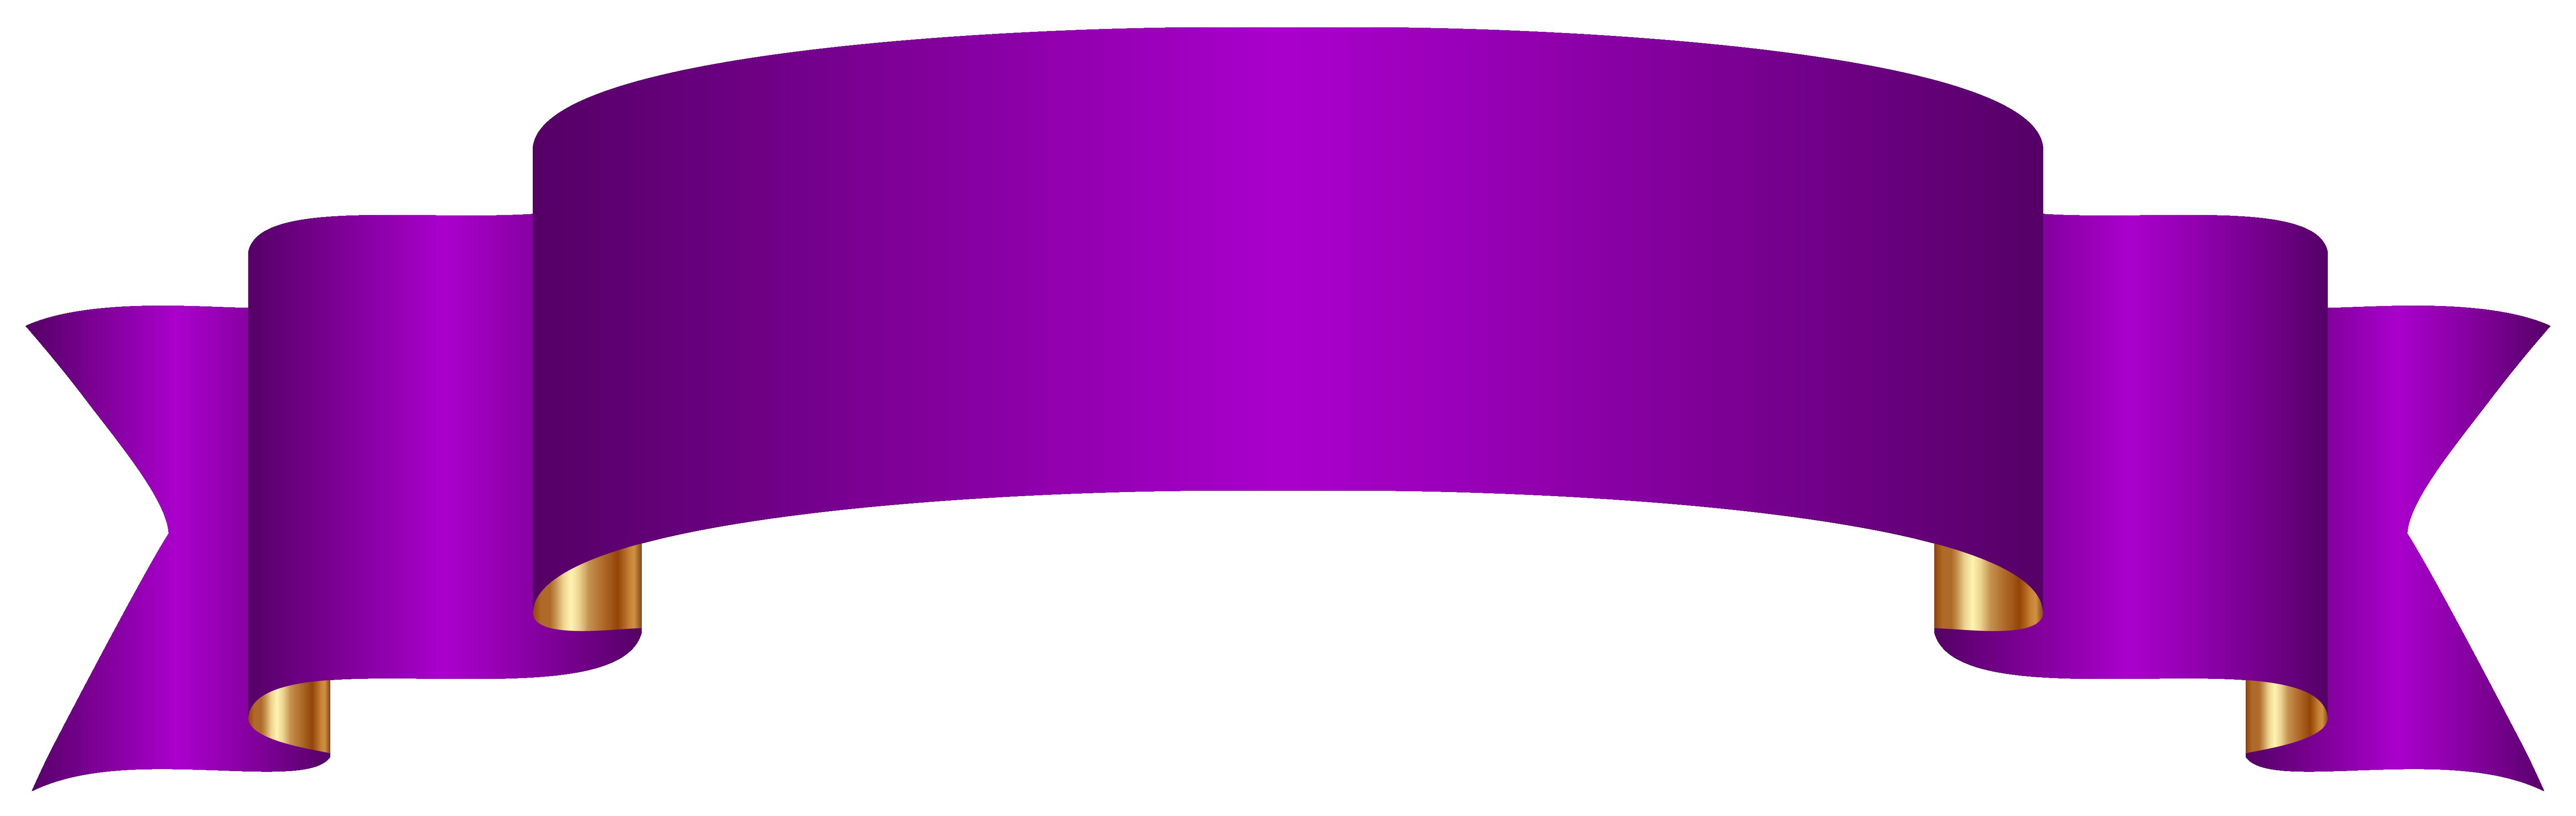 Purple Banner Transparent Png Clip Art Image Ribbon Png Free Clip Art Clip Art